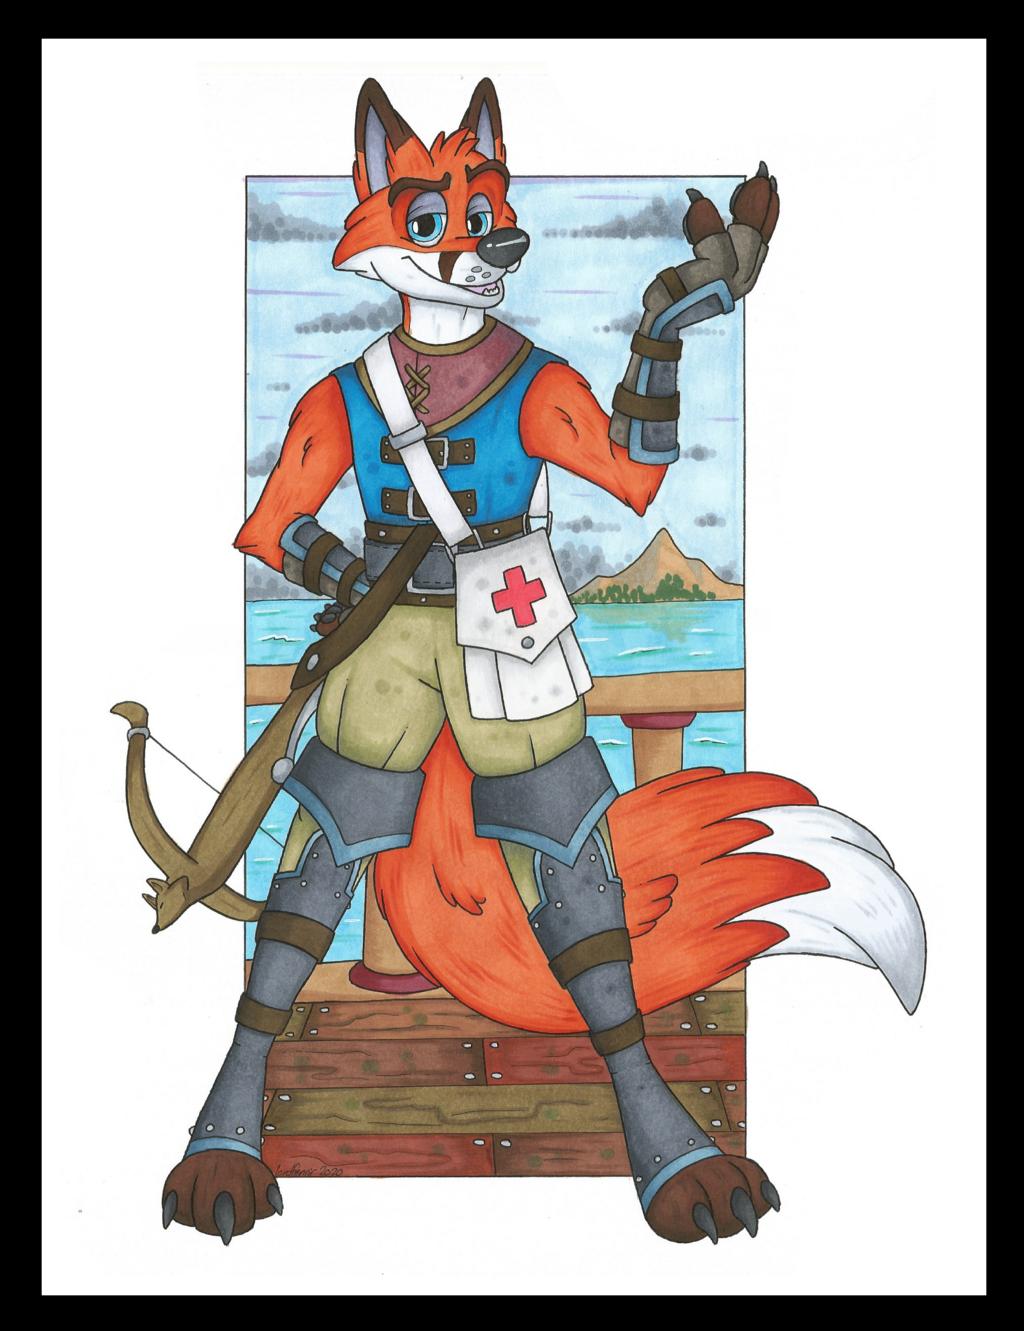 Most recent image: Joseph King, Fox Bard